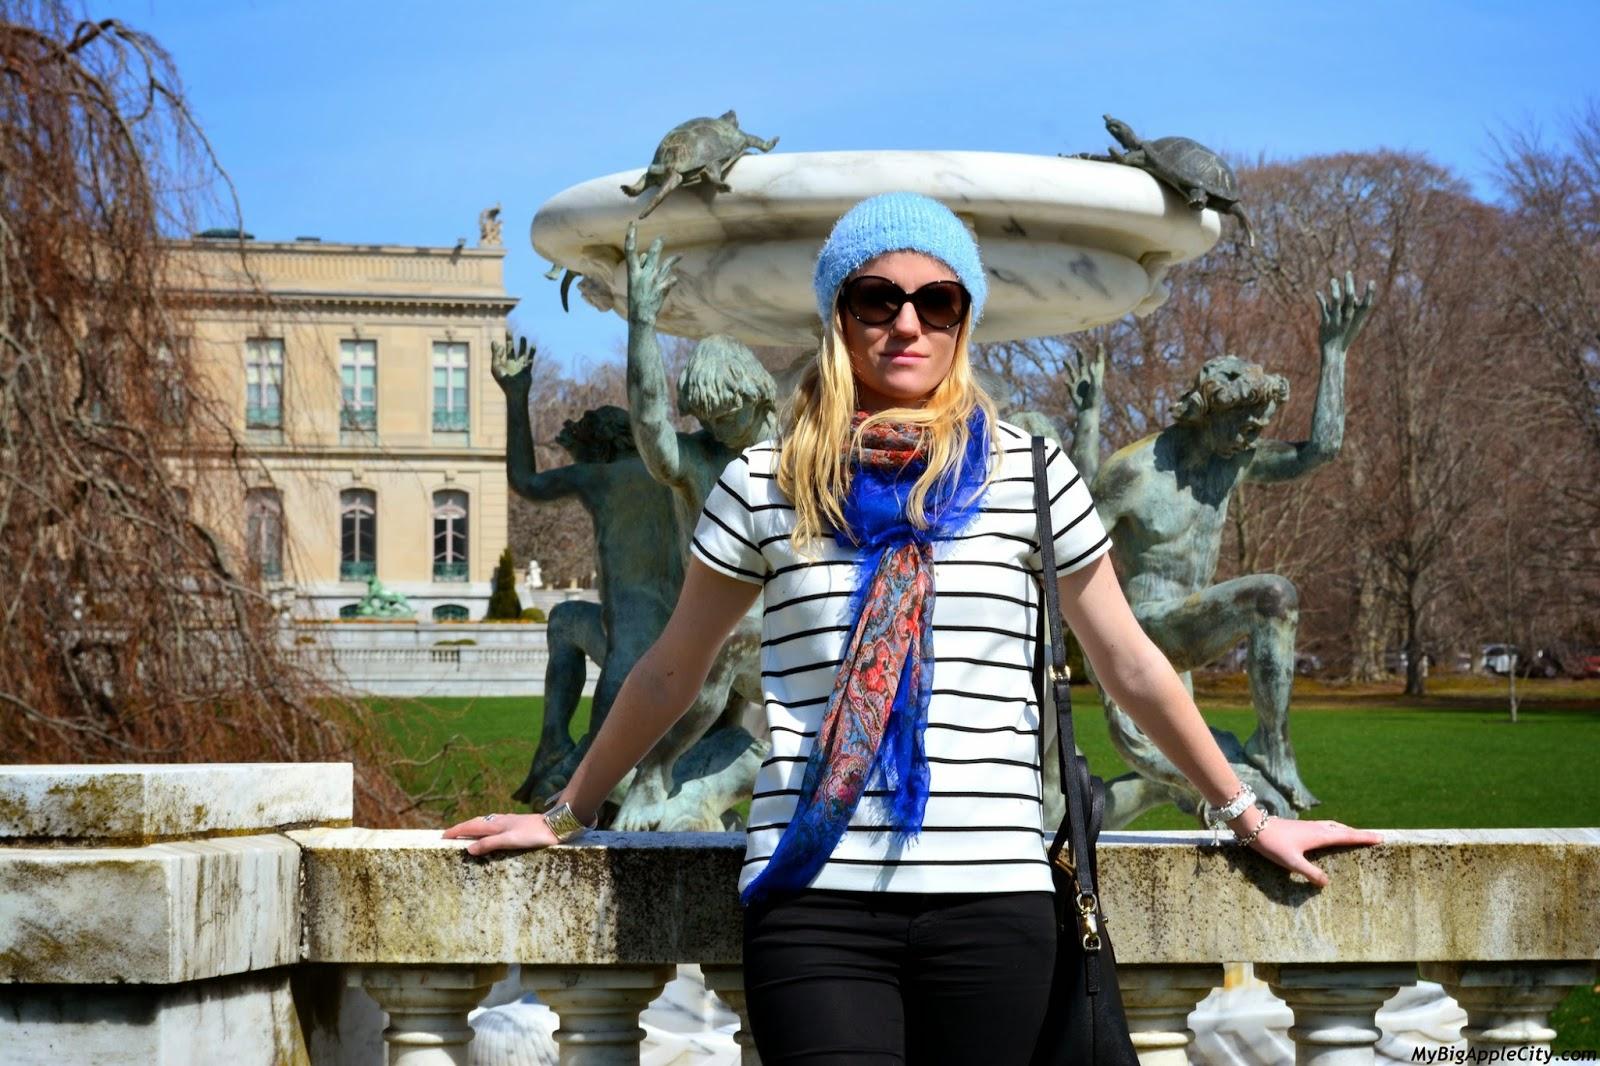 fashion-blogger-style-ootd-mybigapplecity-newyork